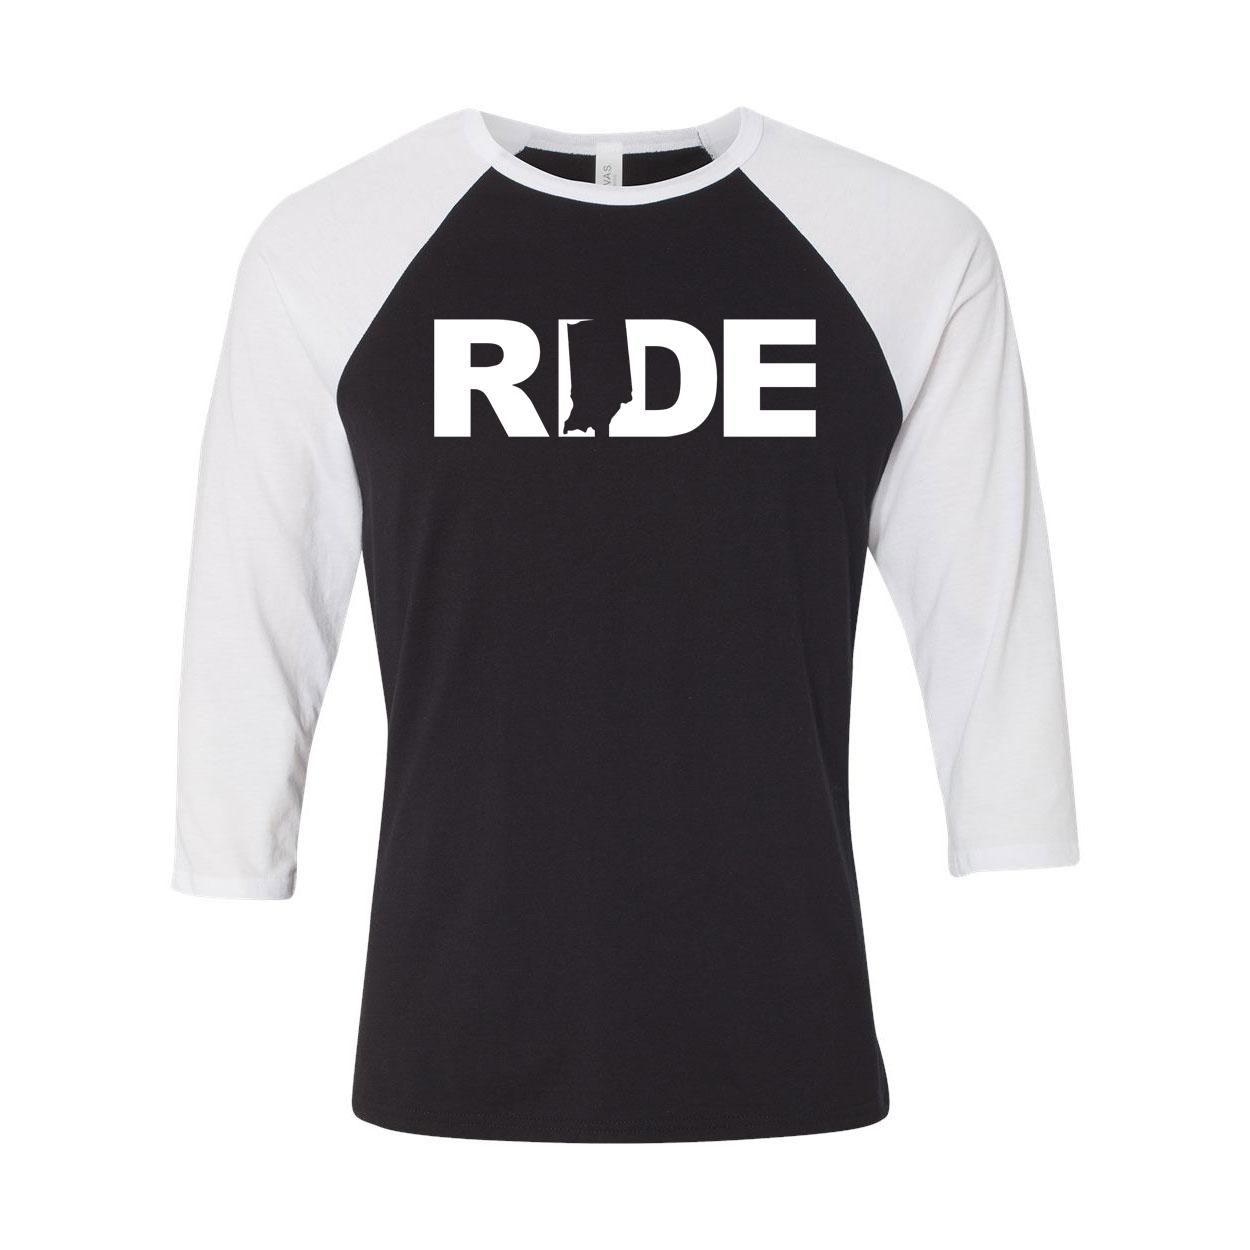 Ride Indiana Classic Raglan Shirt Black/White (White Logo)